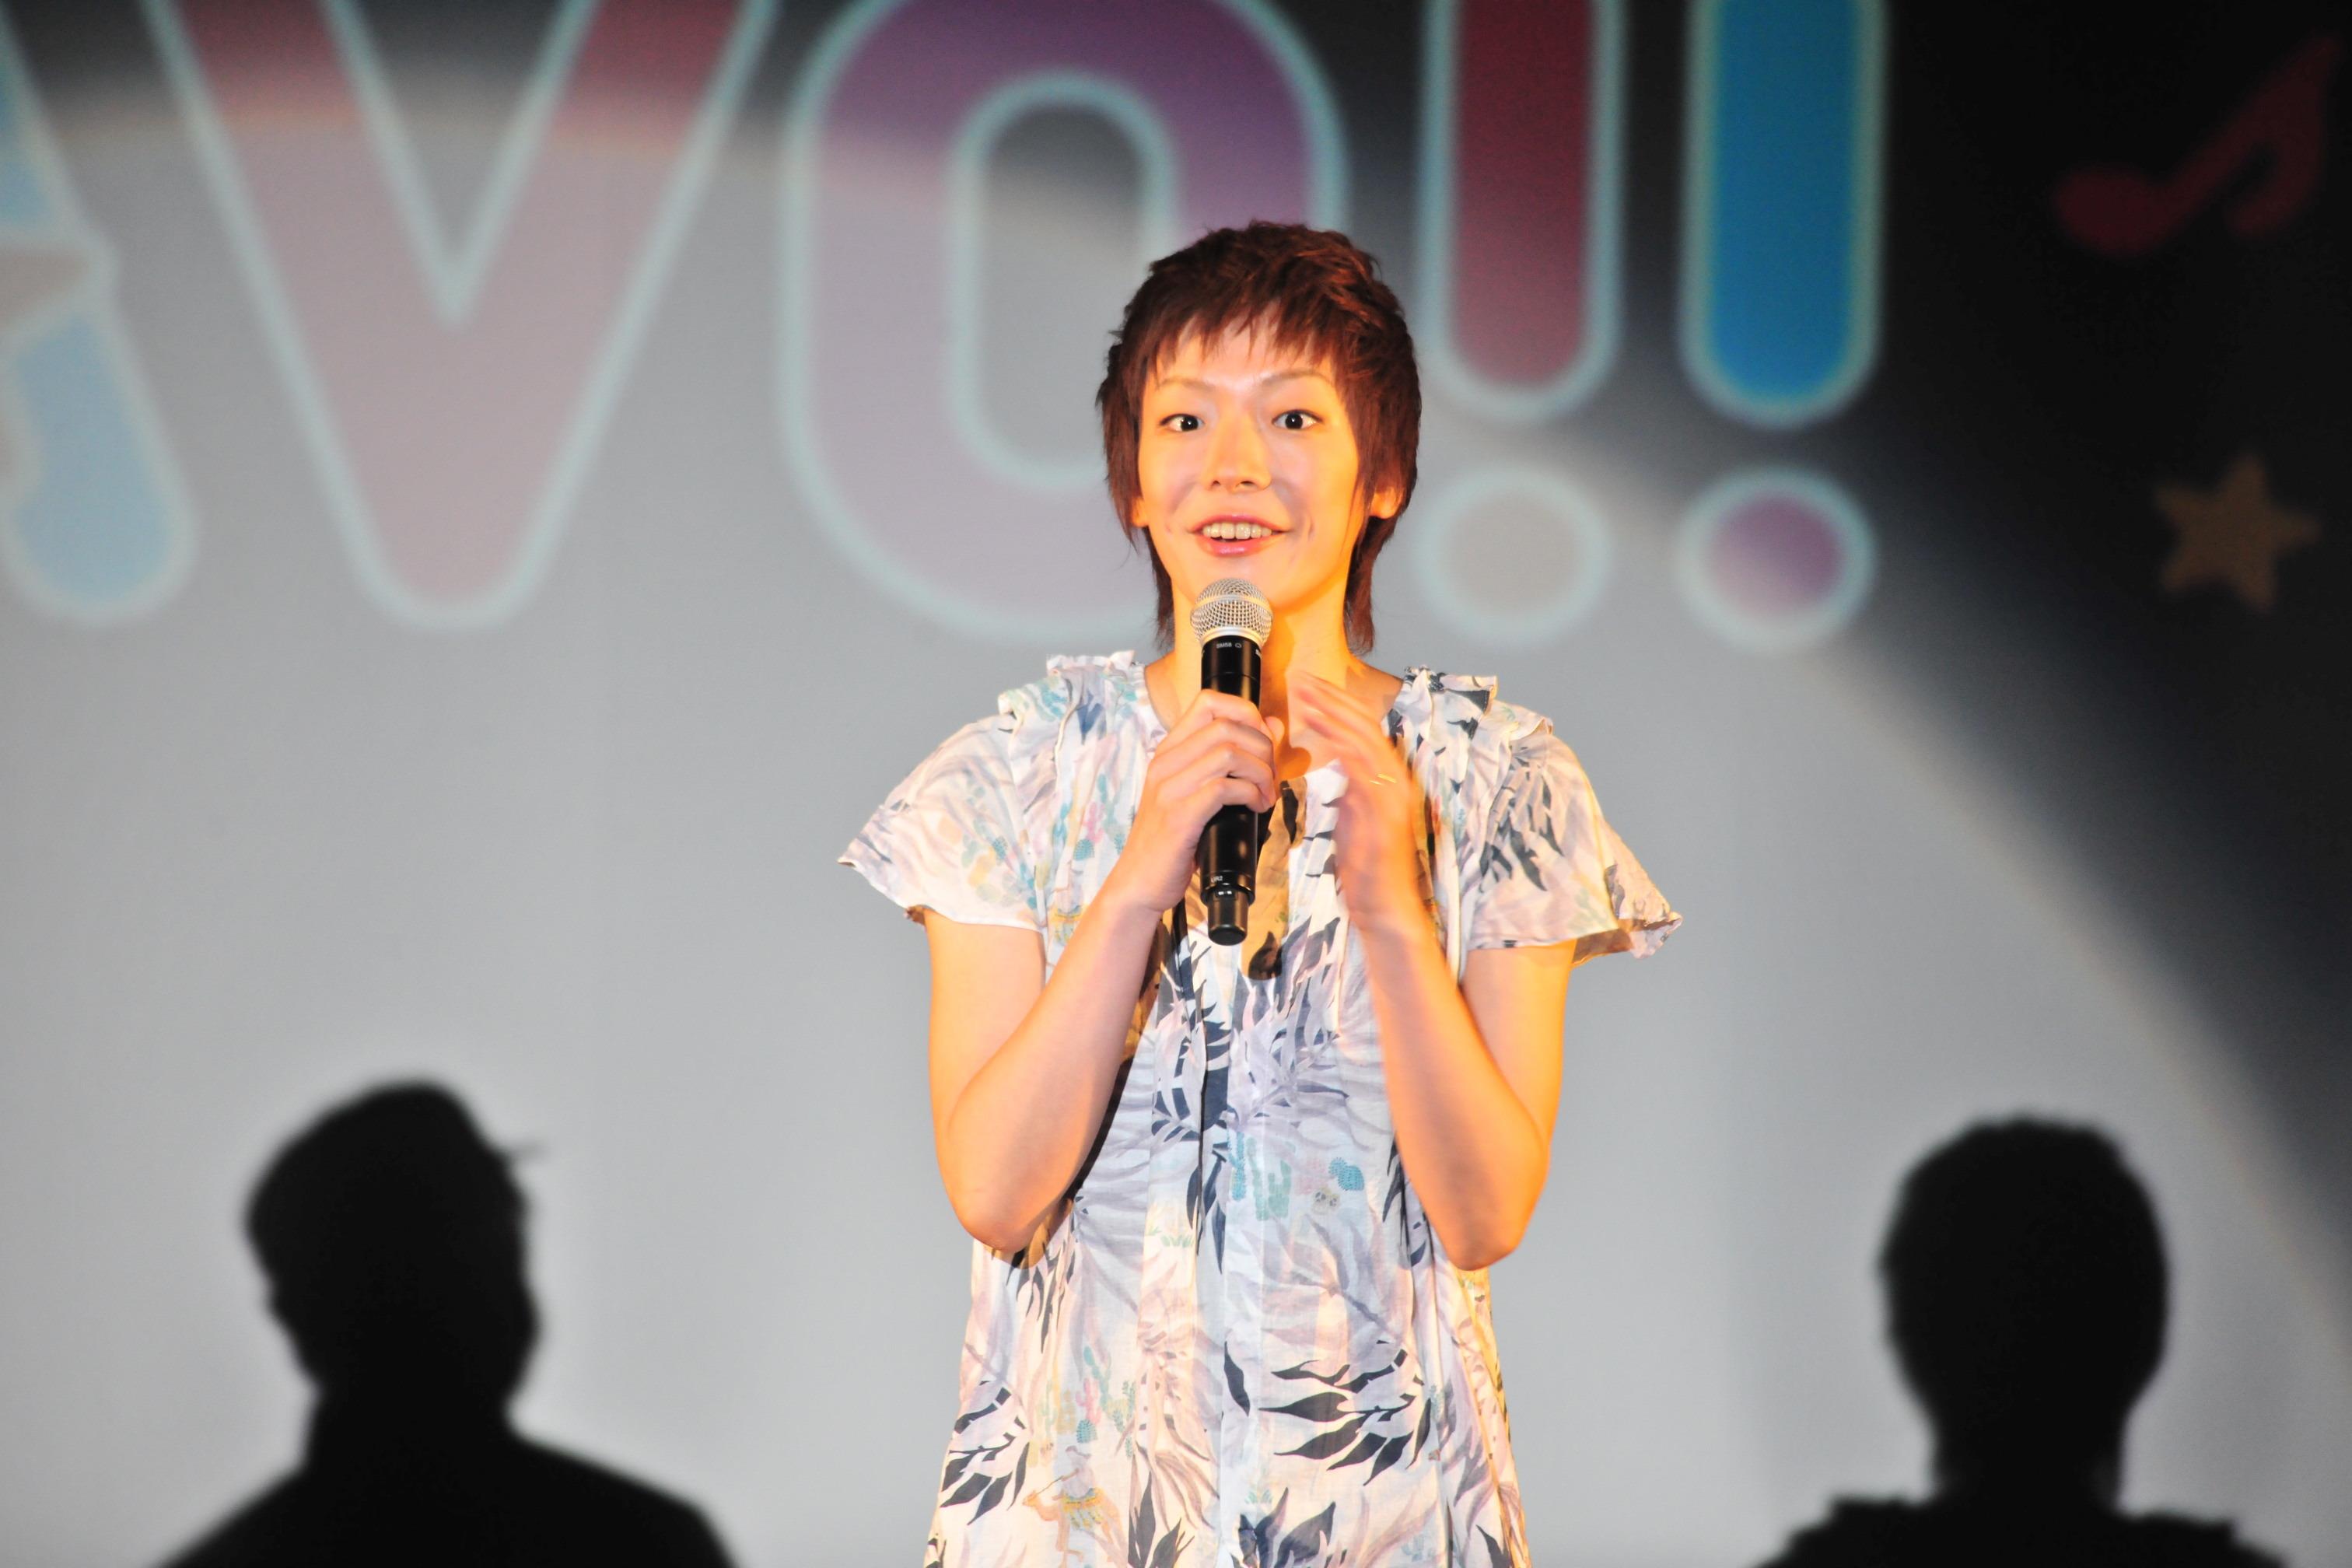 http://news.yoshimoto.co.jp/photos/uncategorized/2015/06/30/20150630182824-f3bc74a55d9024361b2a4082a5b61eaecbf47a79.jpg